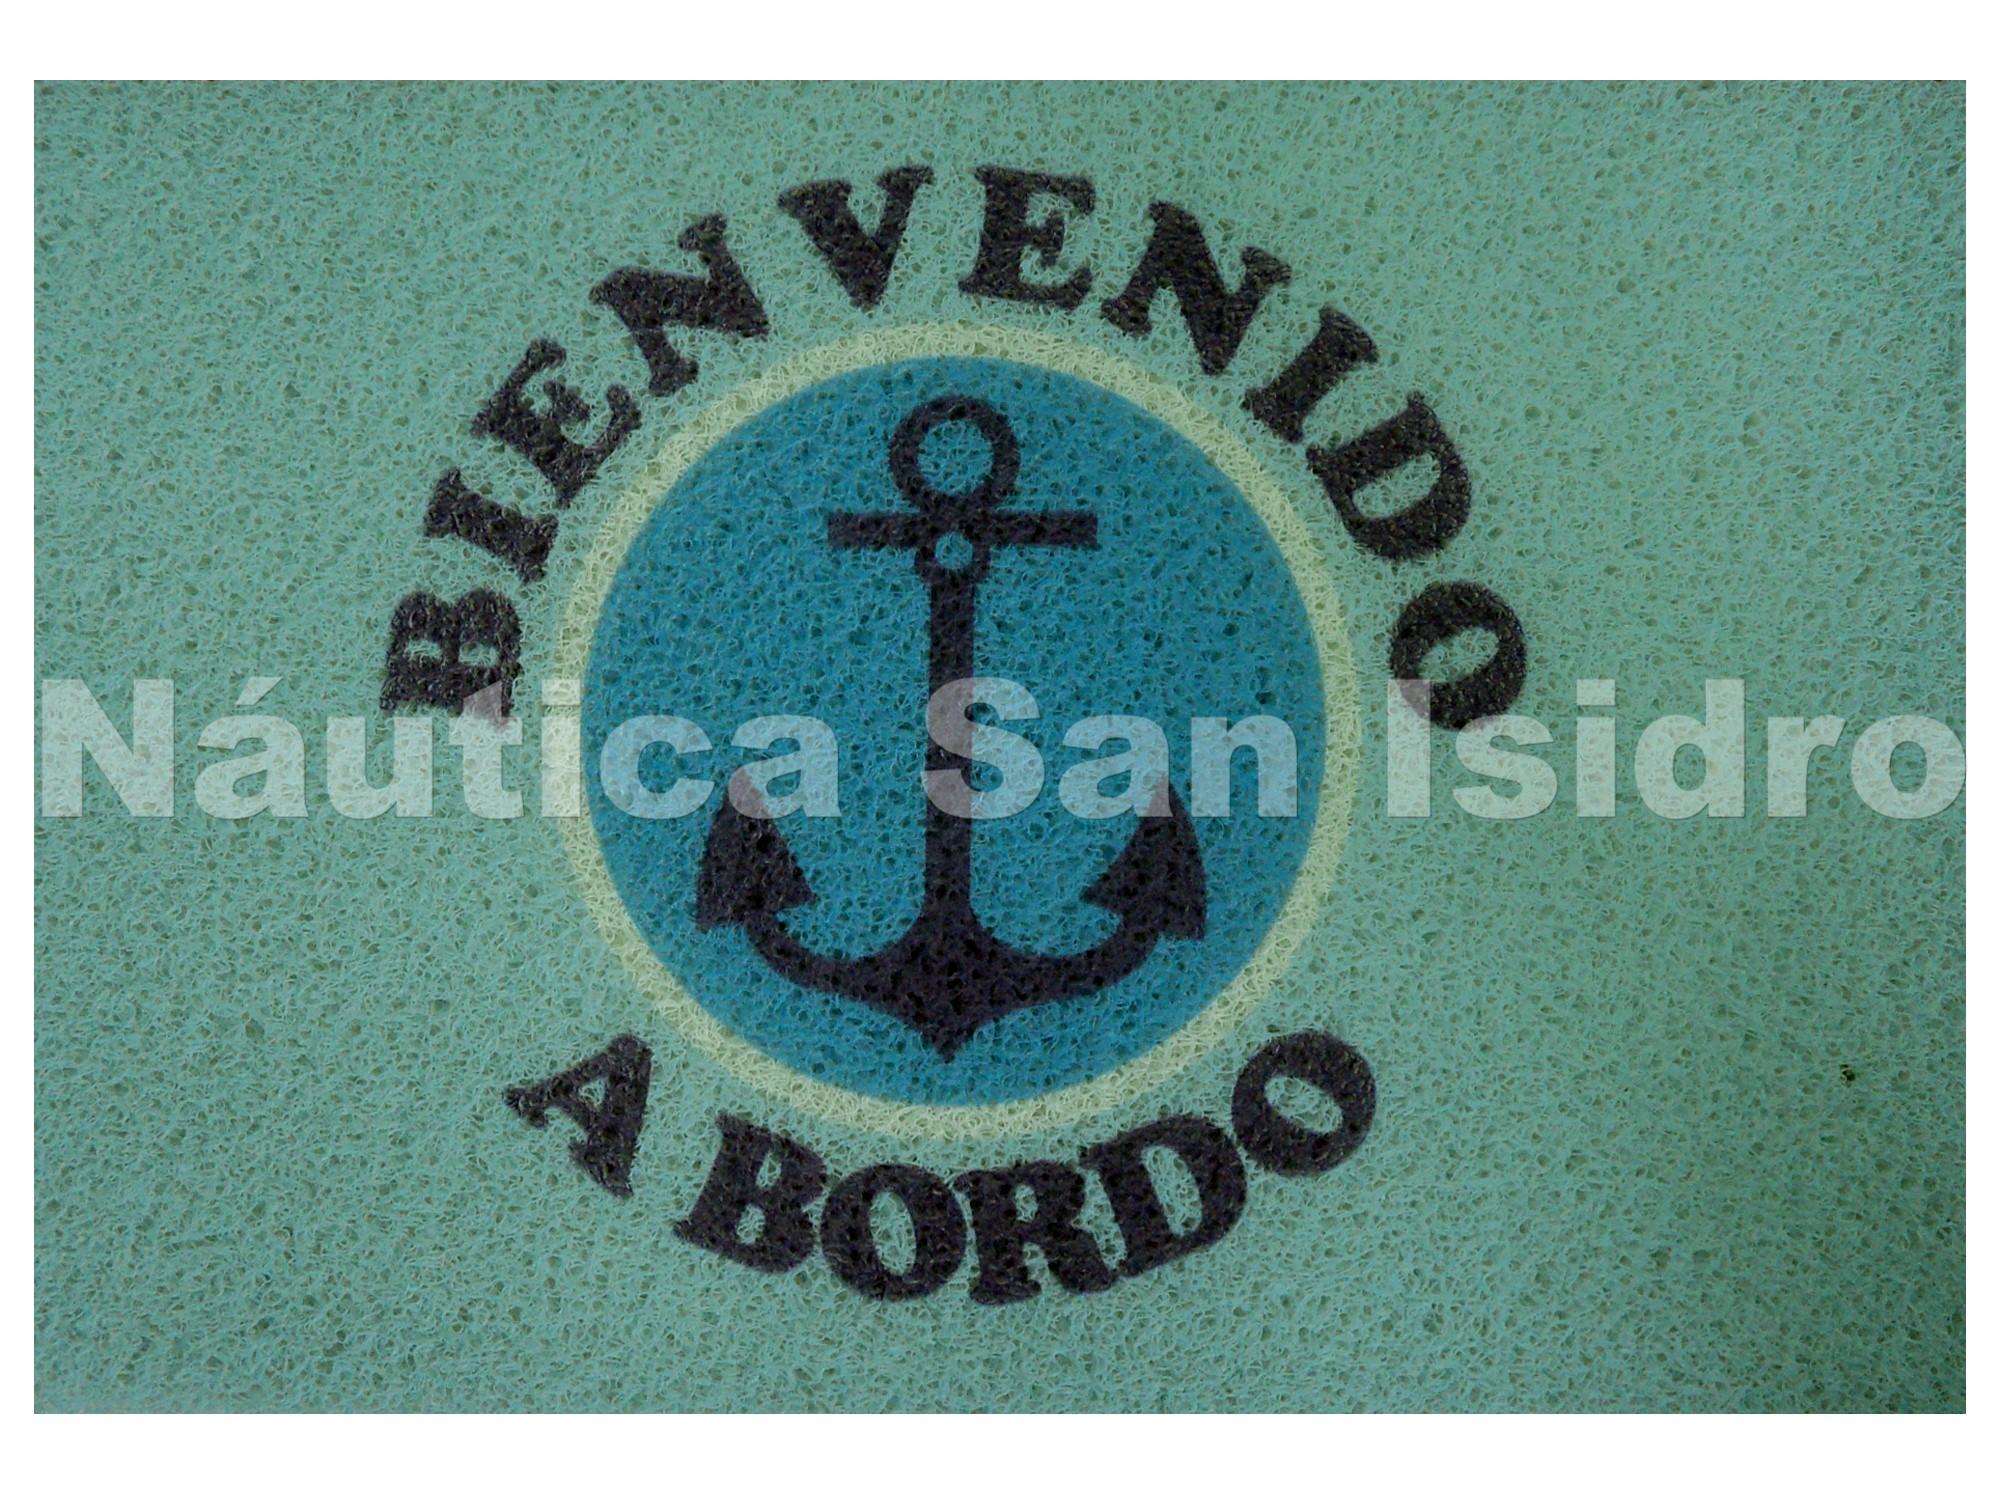 Nautica San Isidro